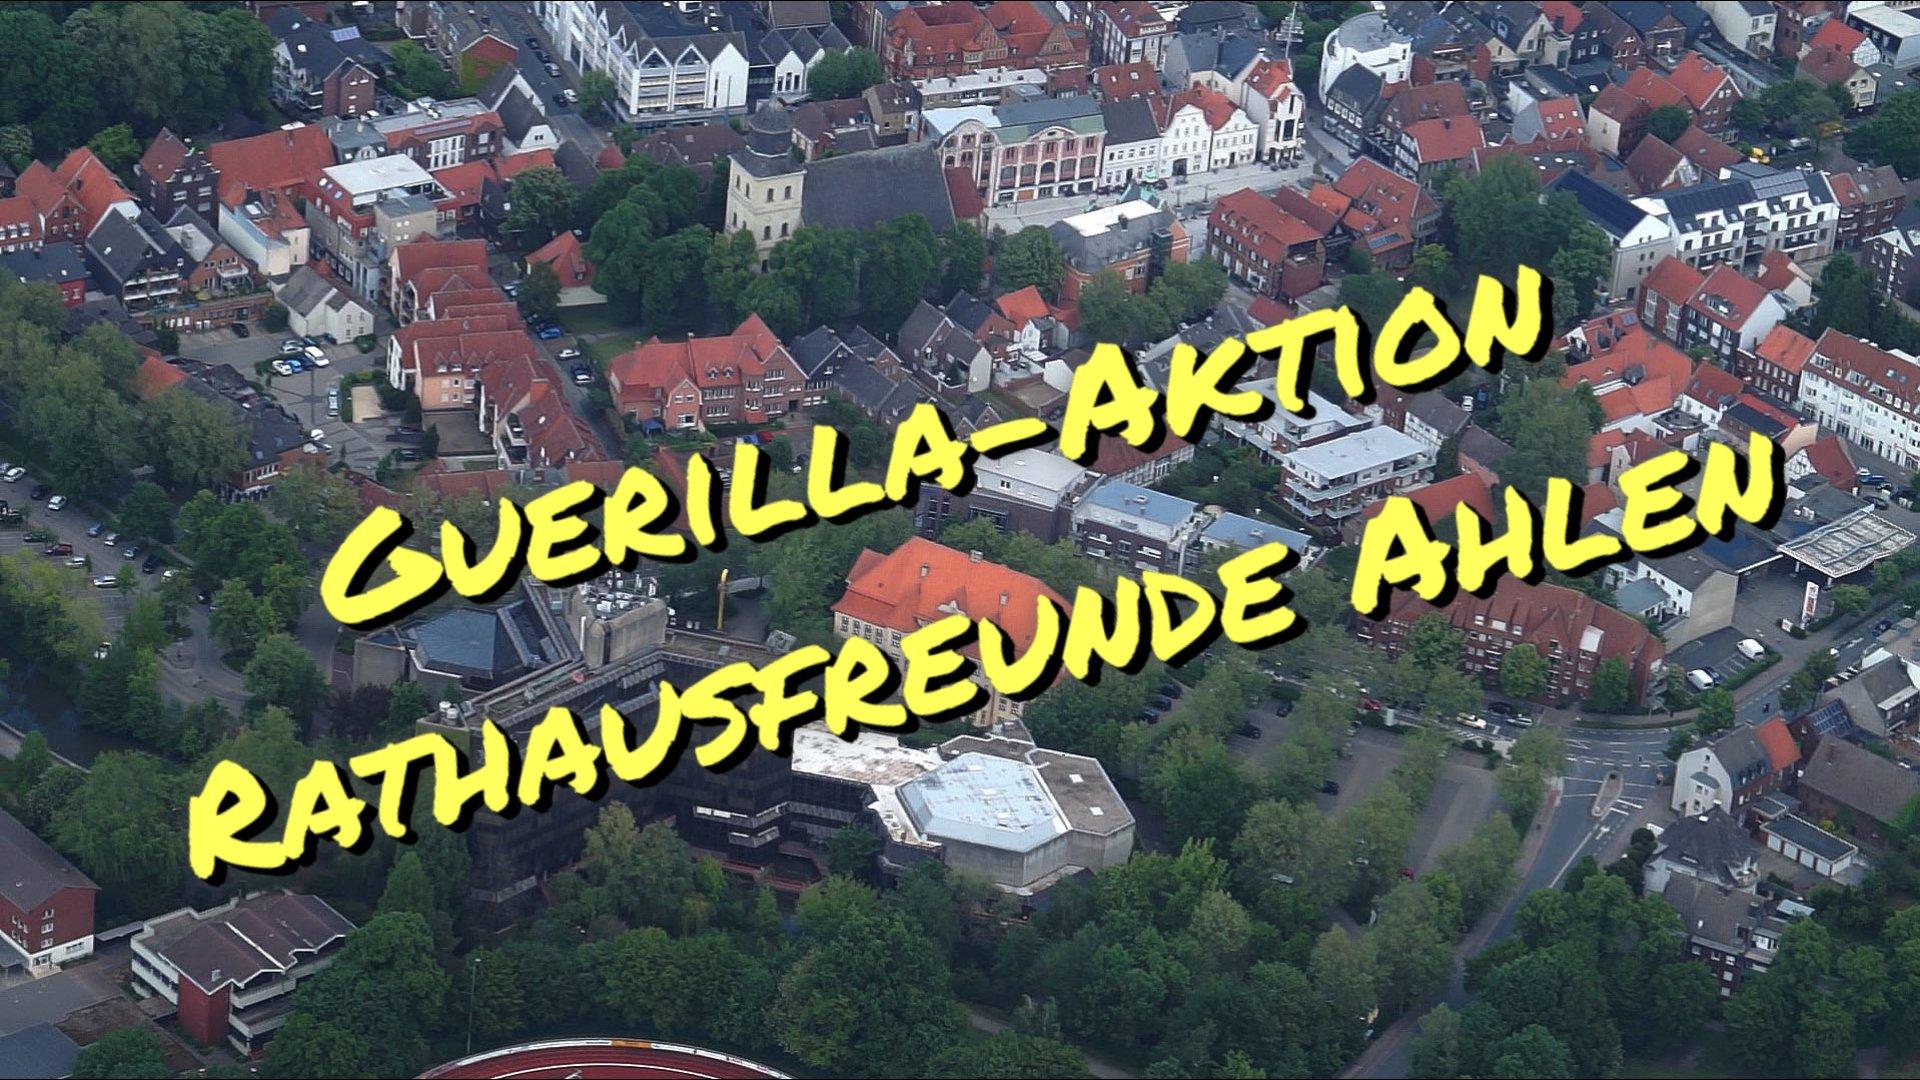 Guerilla-Aktion Rathaus